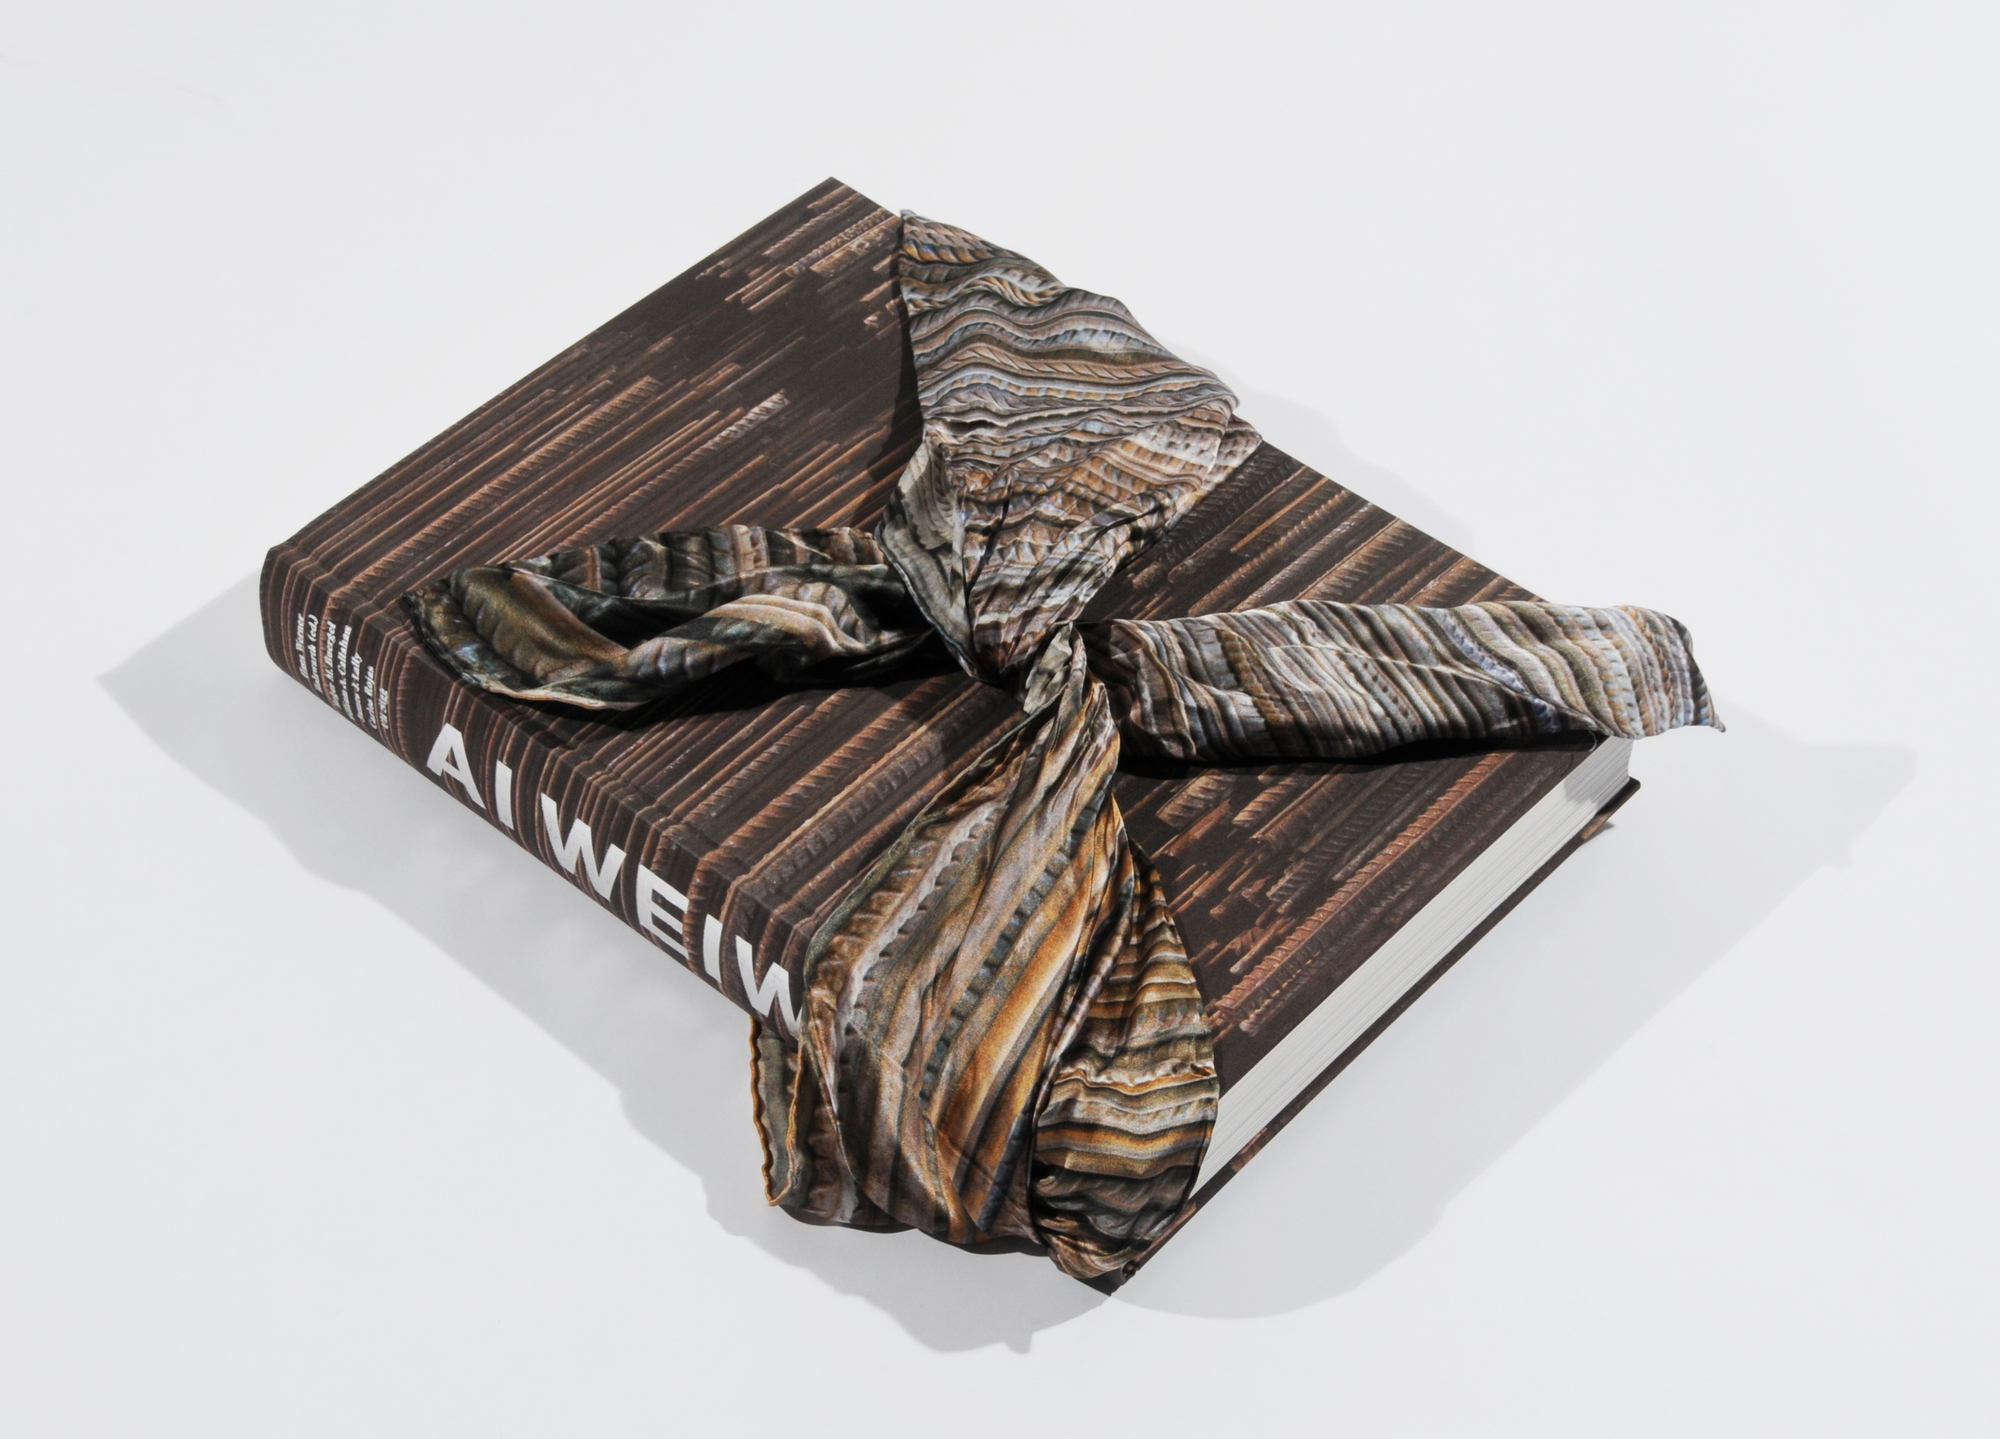 Weiwei Ai, Book. Hans Werner Holzwarth. Ai Weiwei, Monograph